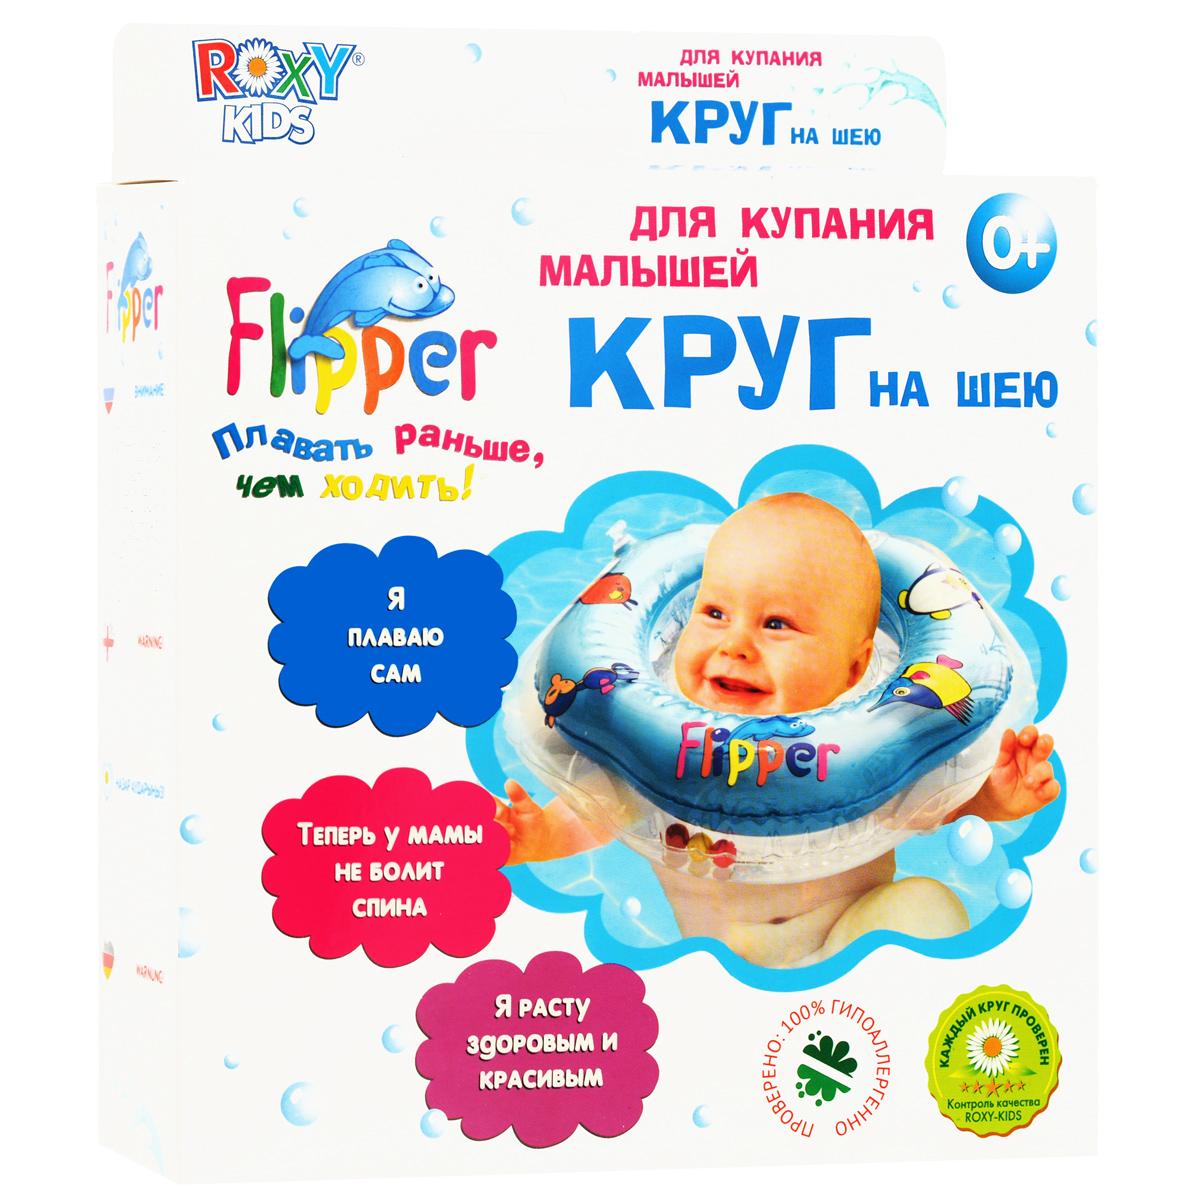 "Круг на шею для купания Roxy-Kids ""Flipper"", цвет: зеленый"